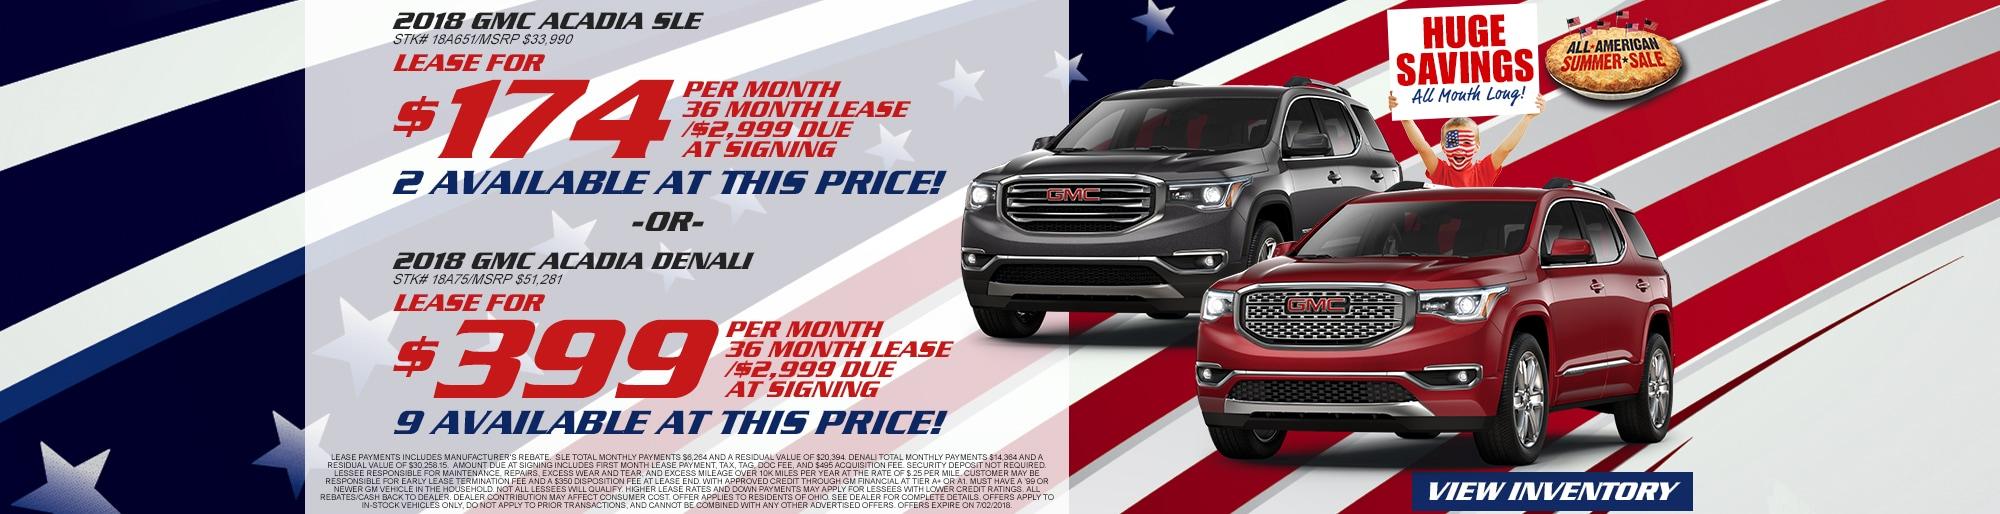 Buick Dealers Columbus Ohio >> Chevrolet Buick GMC , New & Used Chevrolet Buick GMC Dealership in Columbus, OH, Serving Dublin ...